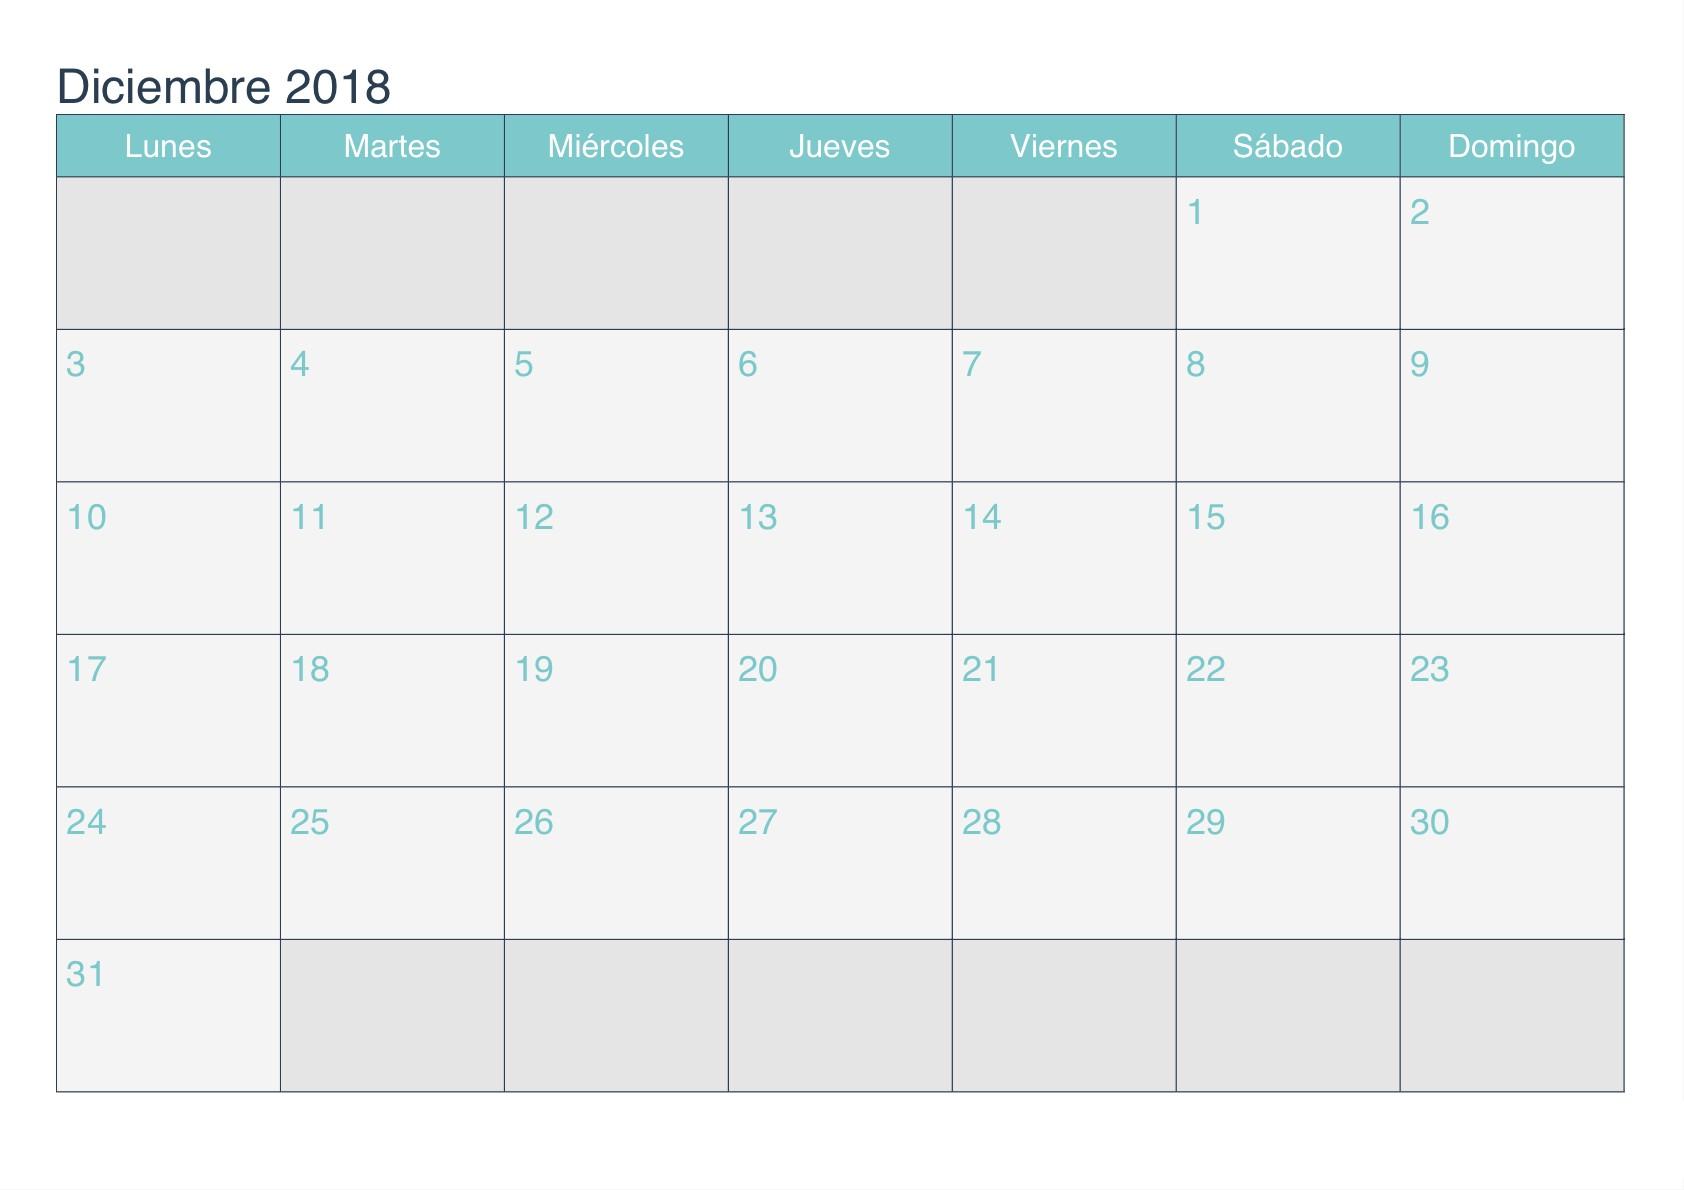 Calendario Diciembre 2018 Para Imprimir Image